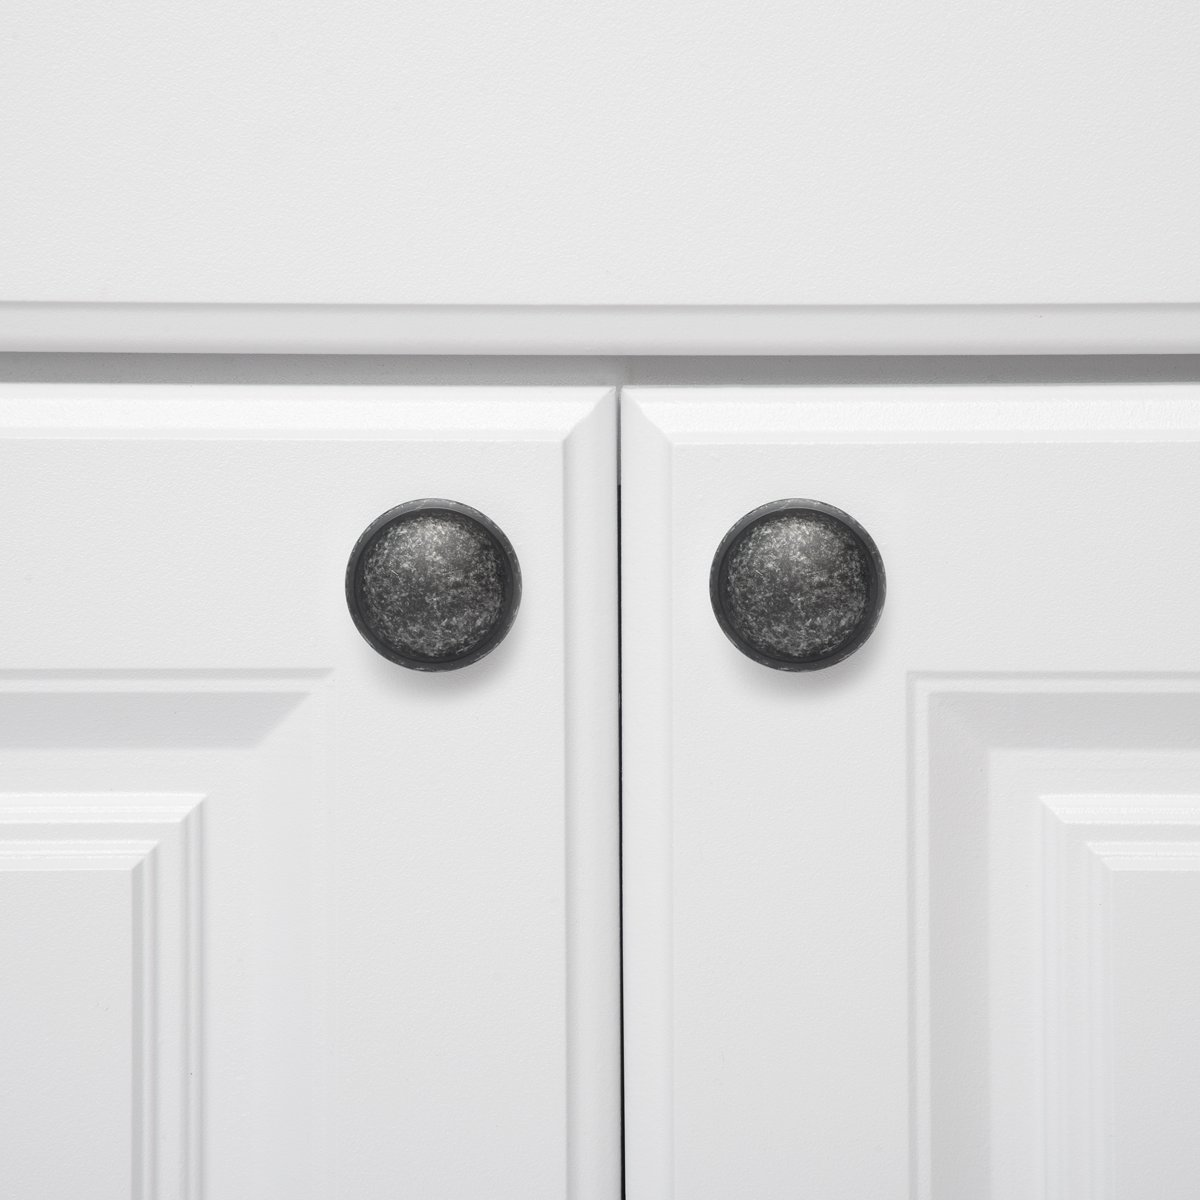 1.19 Diameter 25-Pack Oil Rubbed Bronze Basics Mushroom Cabinet Knob